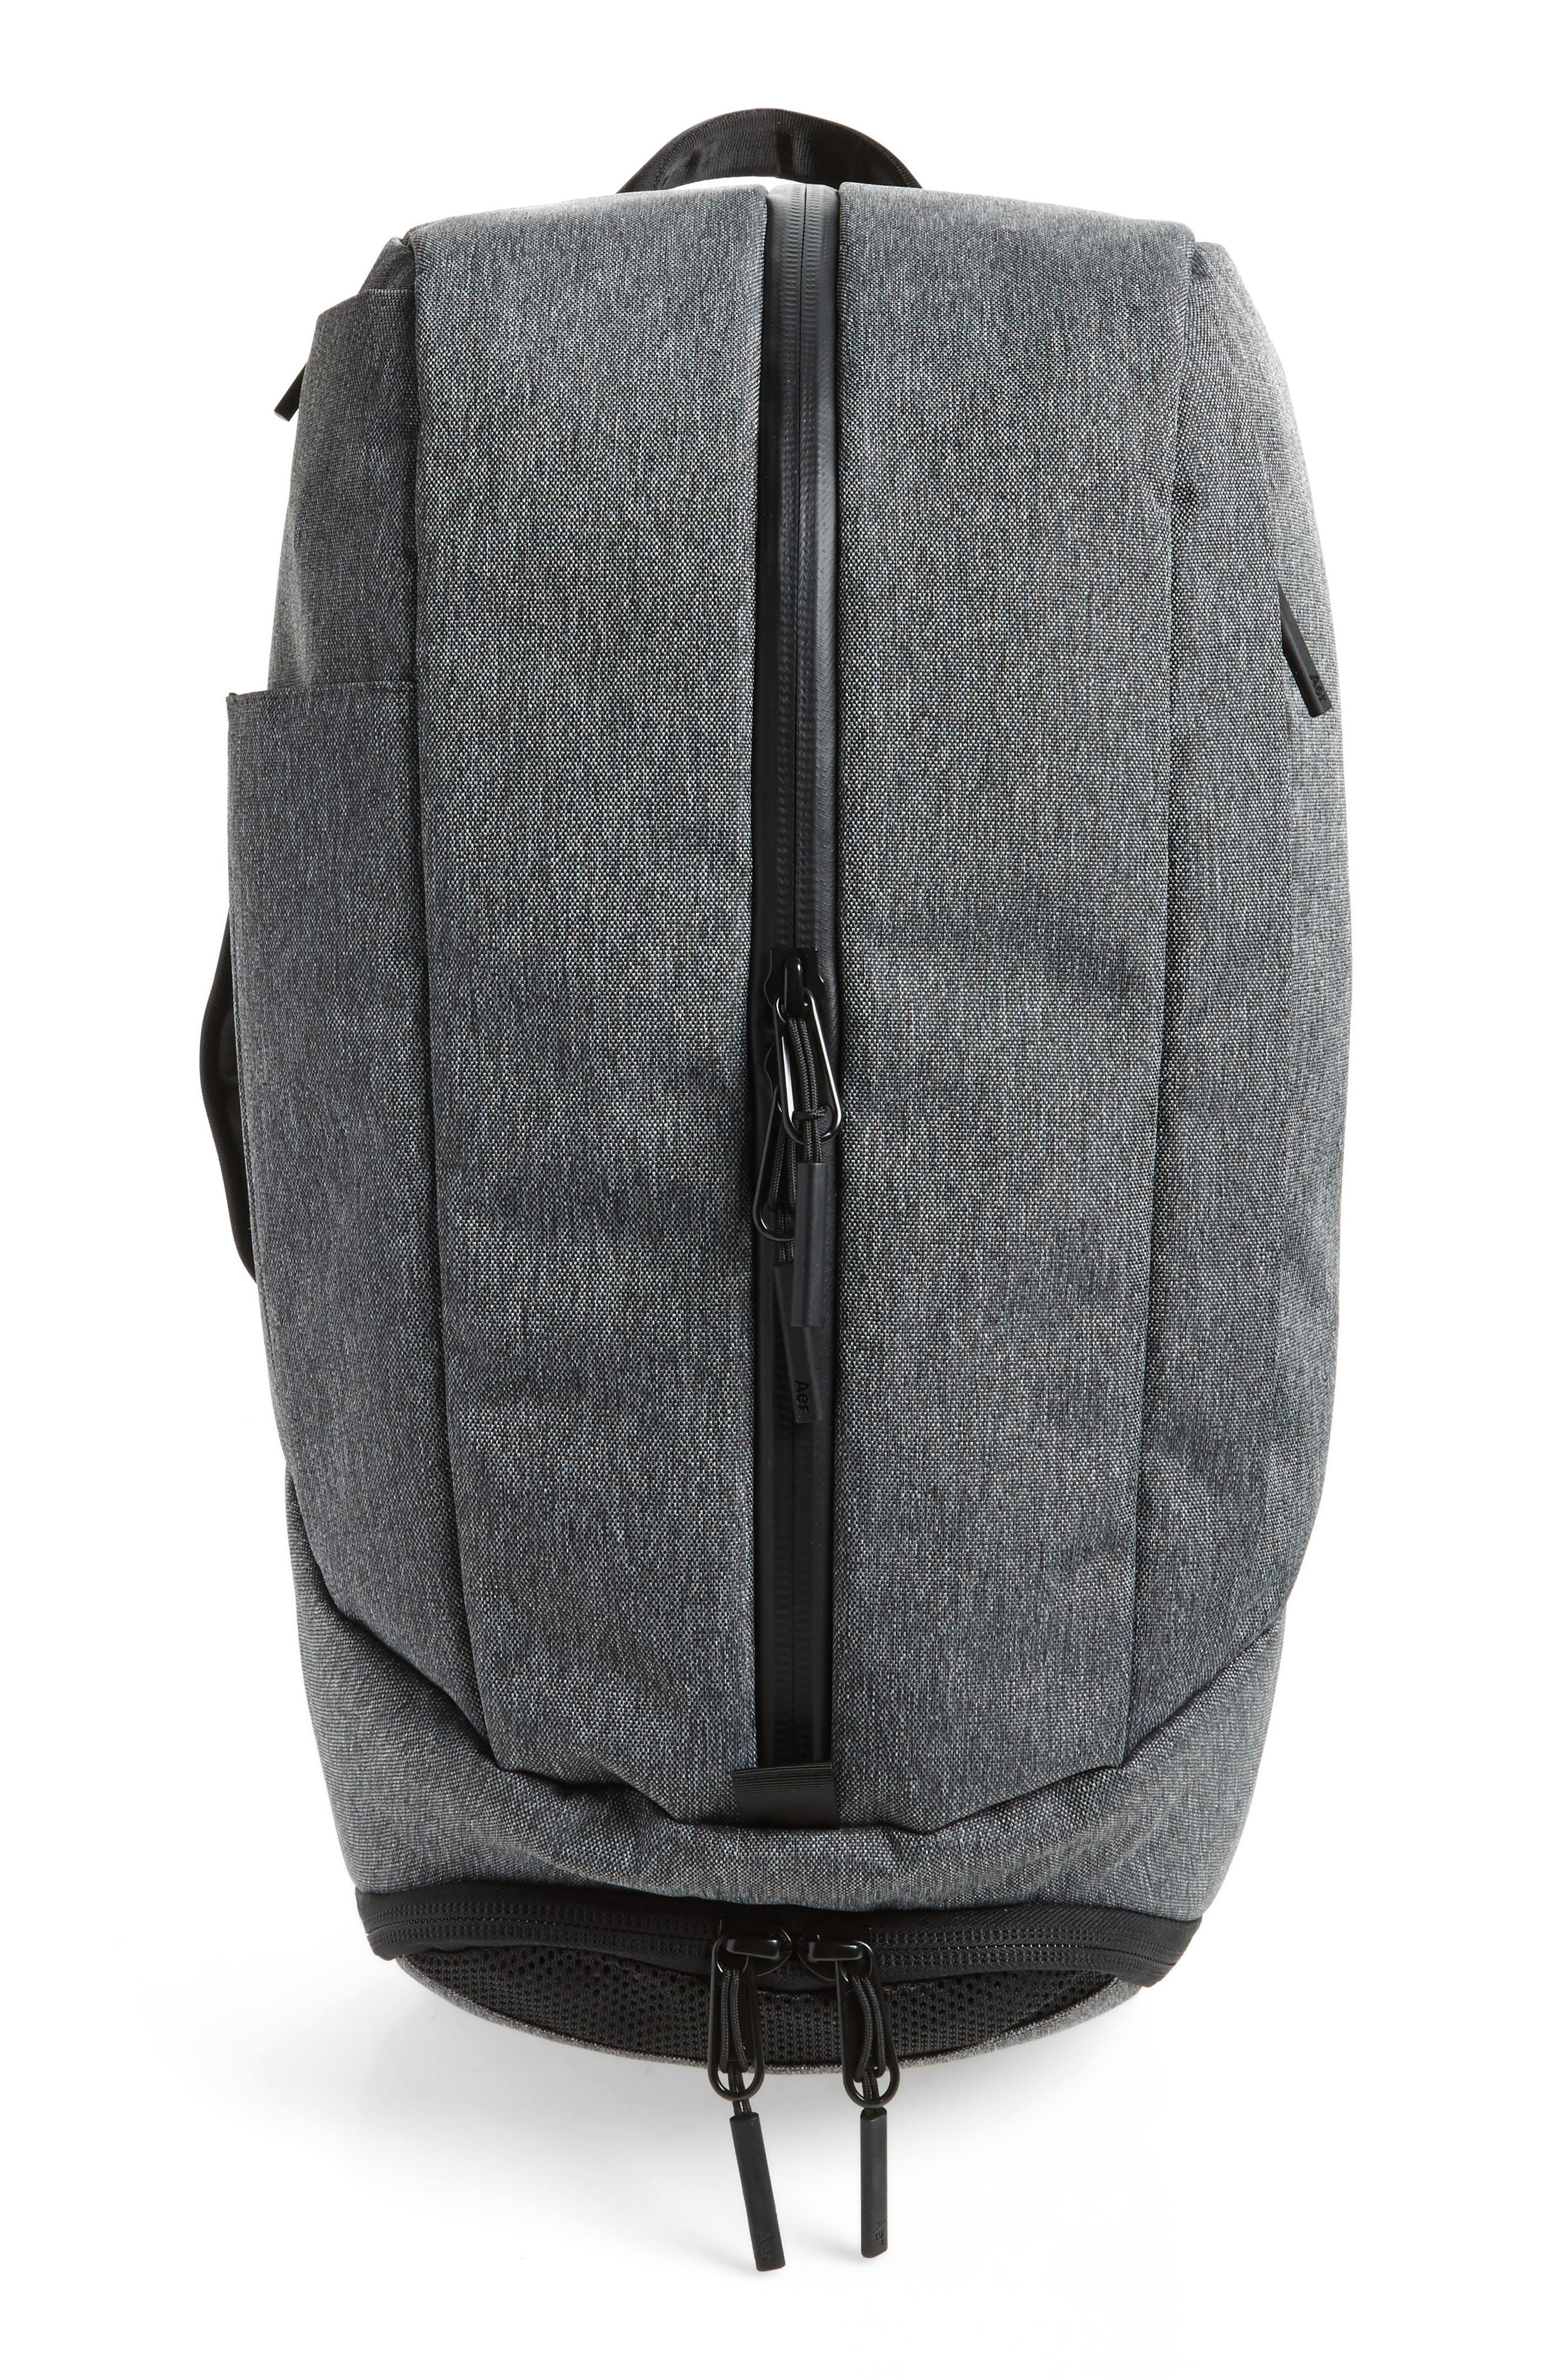 Main Image - Aer Duffel Pack 2 Convertible Backpack